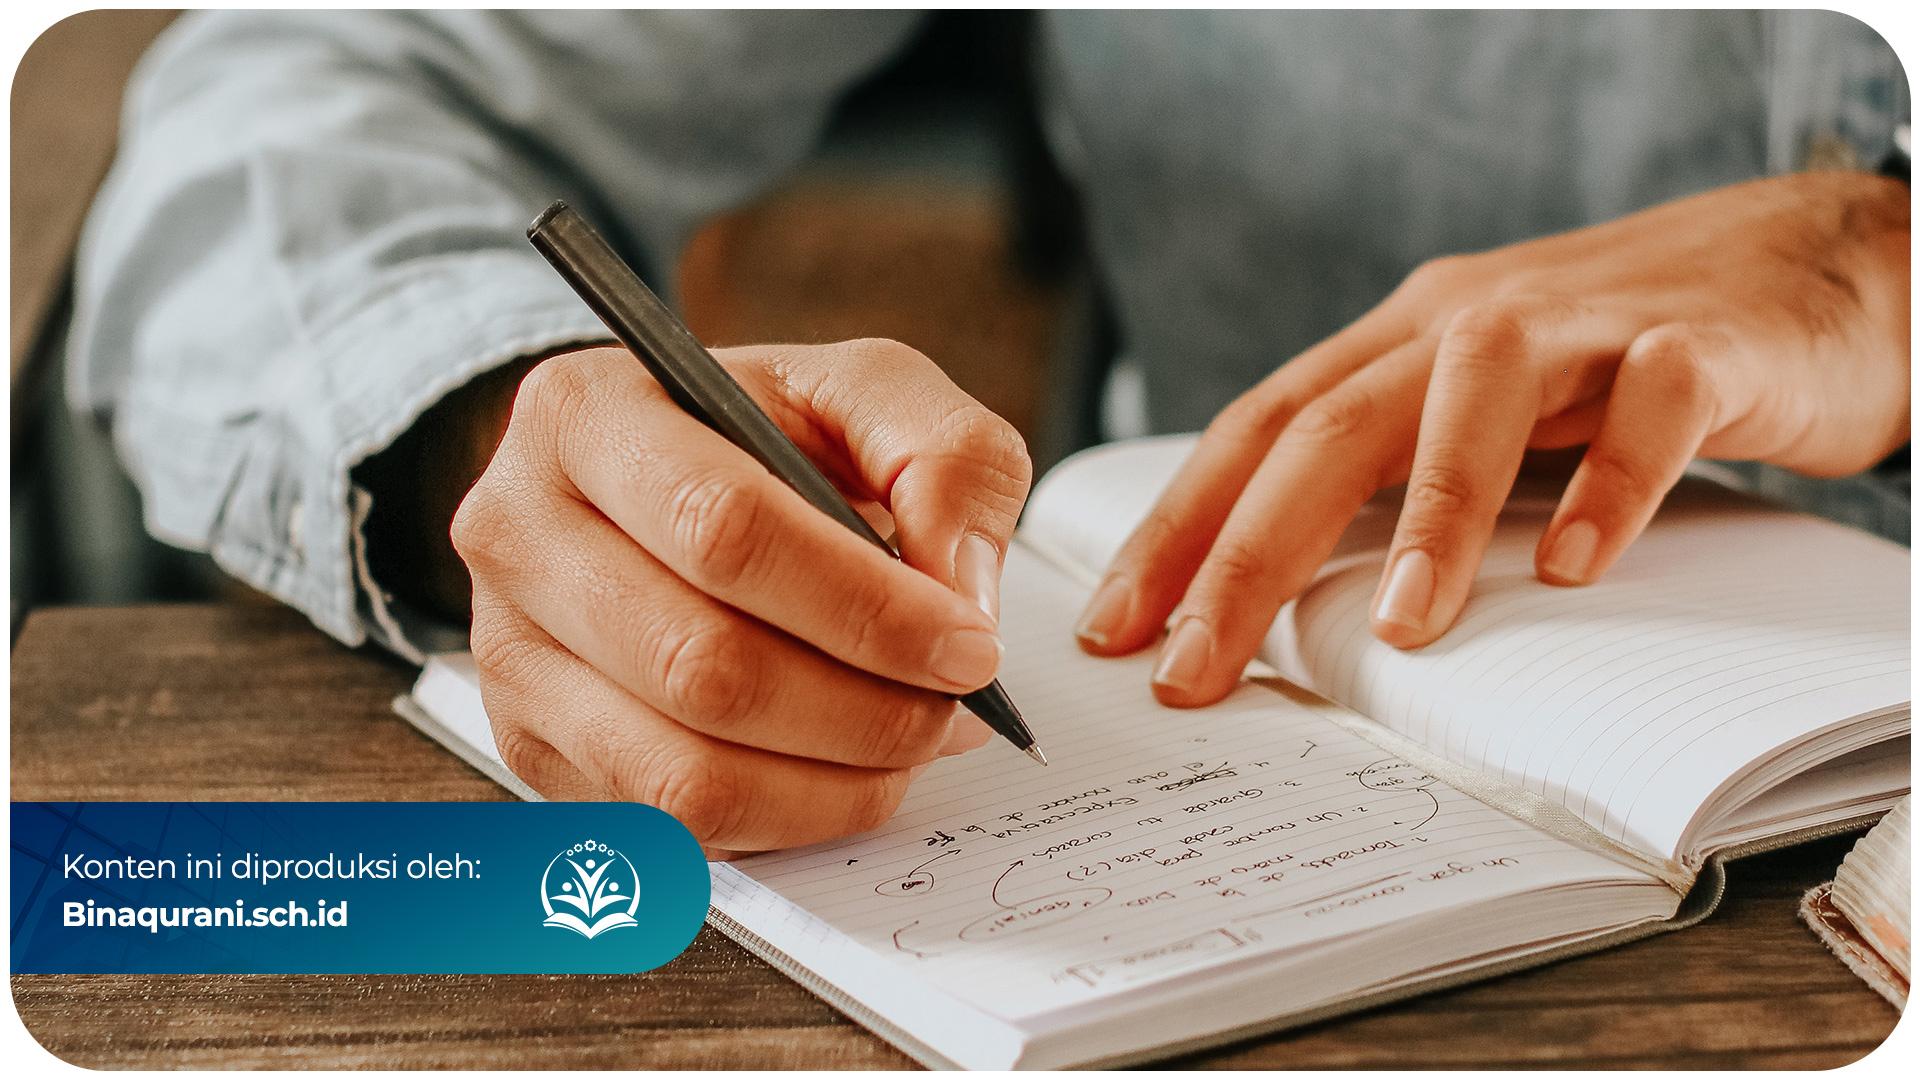 Thumbnail-Bina-Qurani-Cara-Menjadi-Penulis-Pemula-Yang-Menghasilkan-Uang